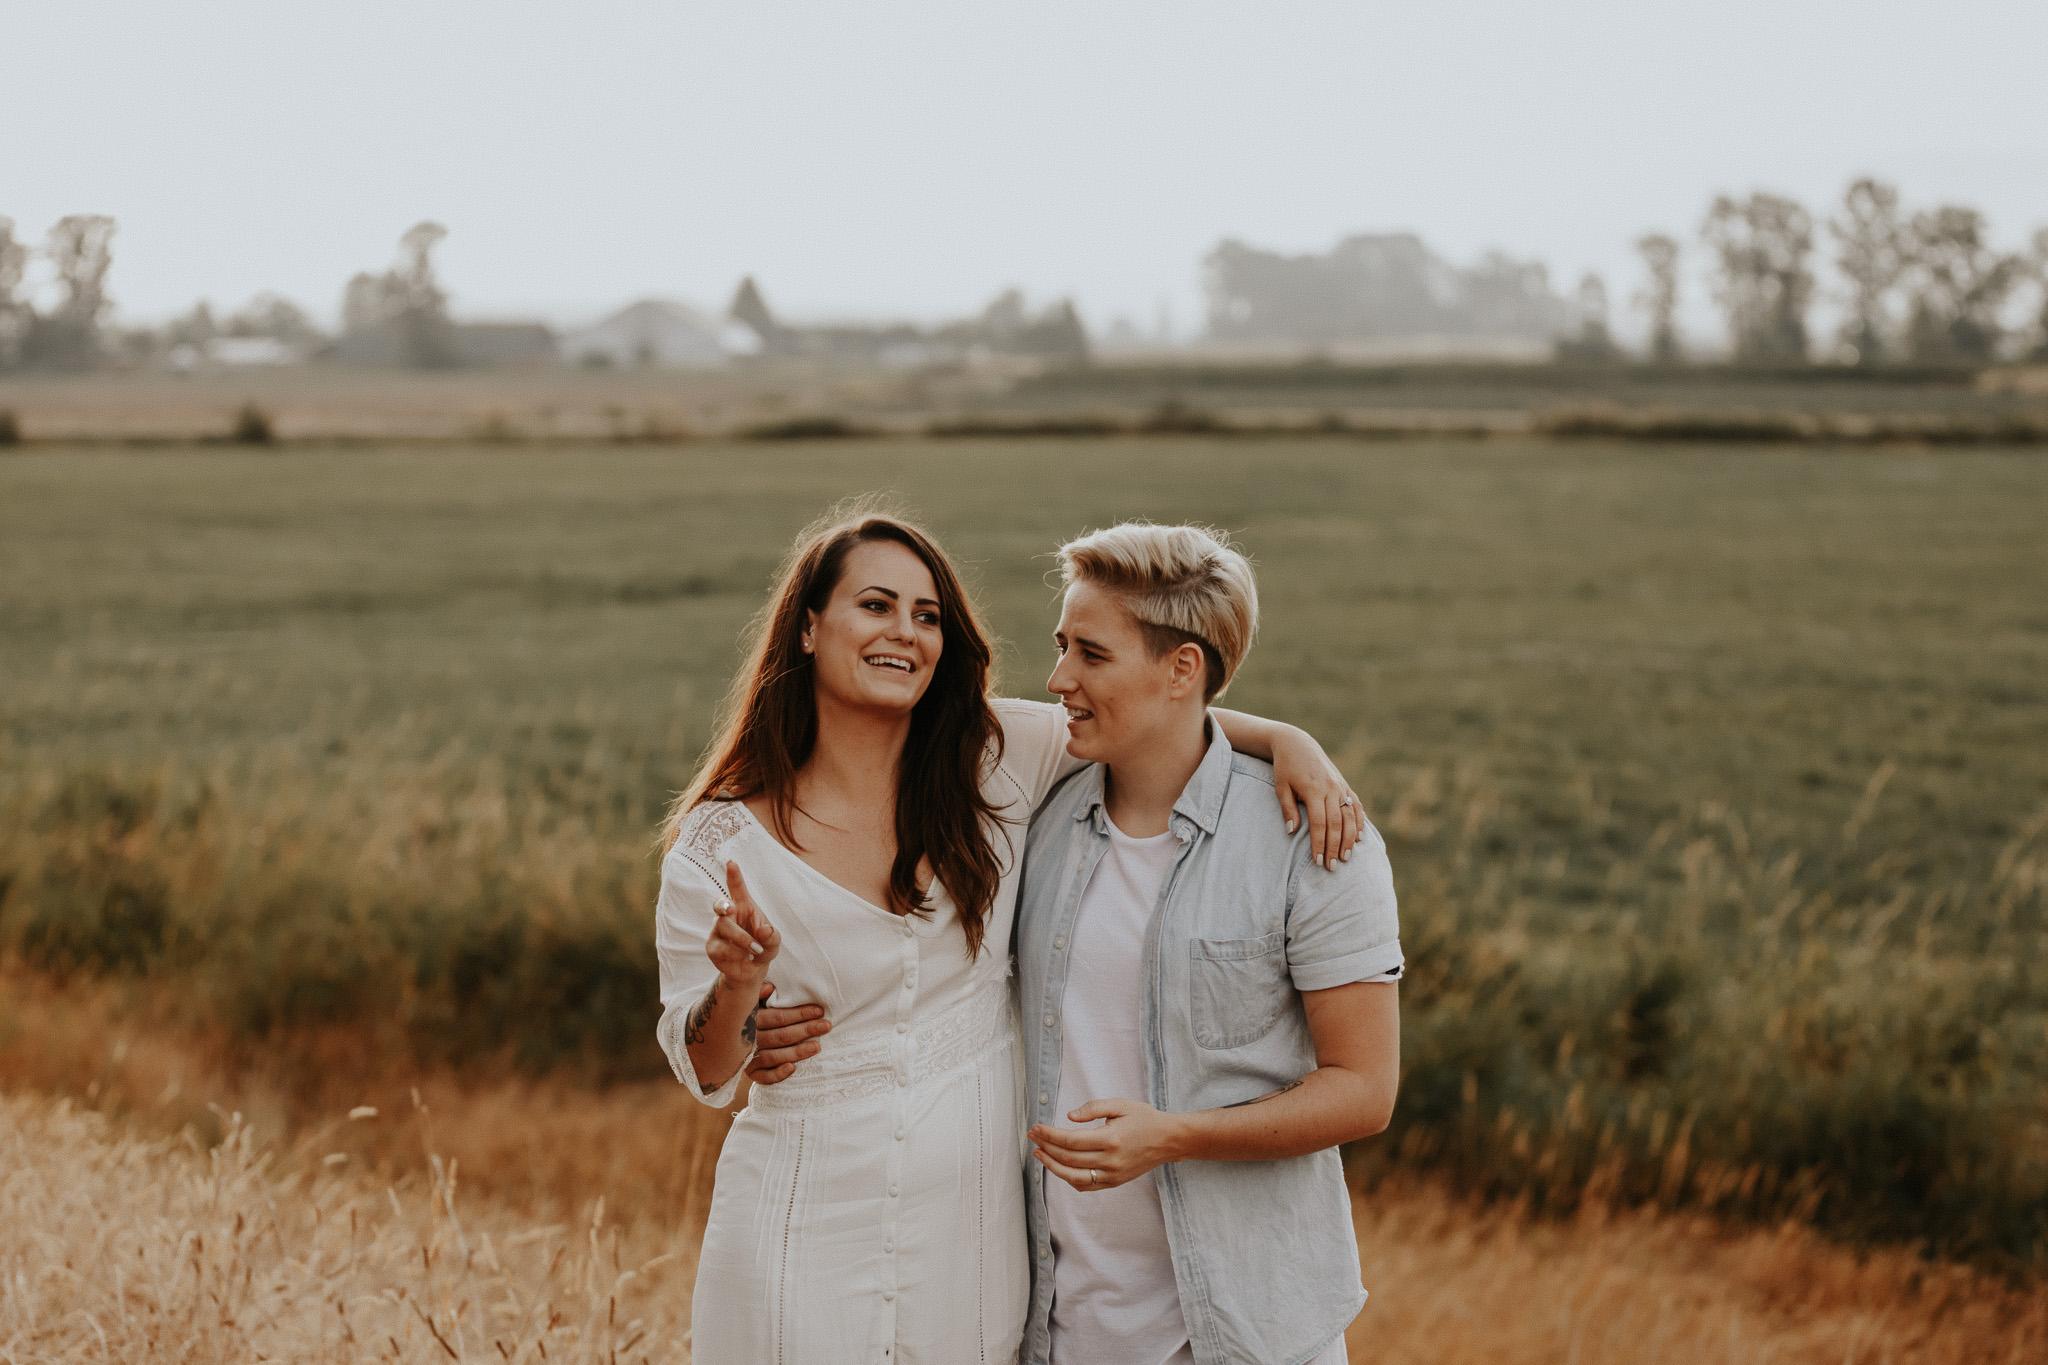 vancouver wedding photographer - lifestyle engagement session-6.jpg